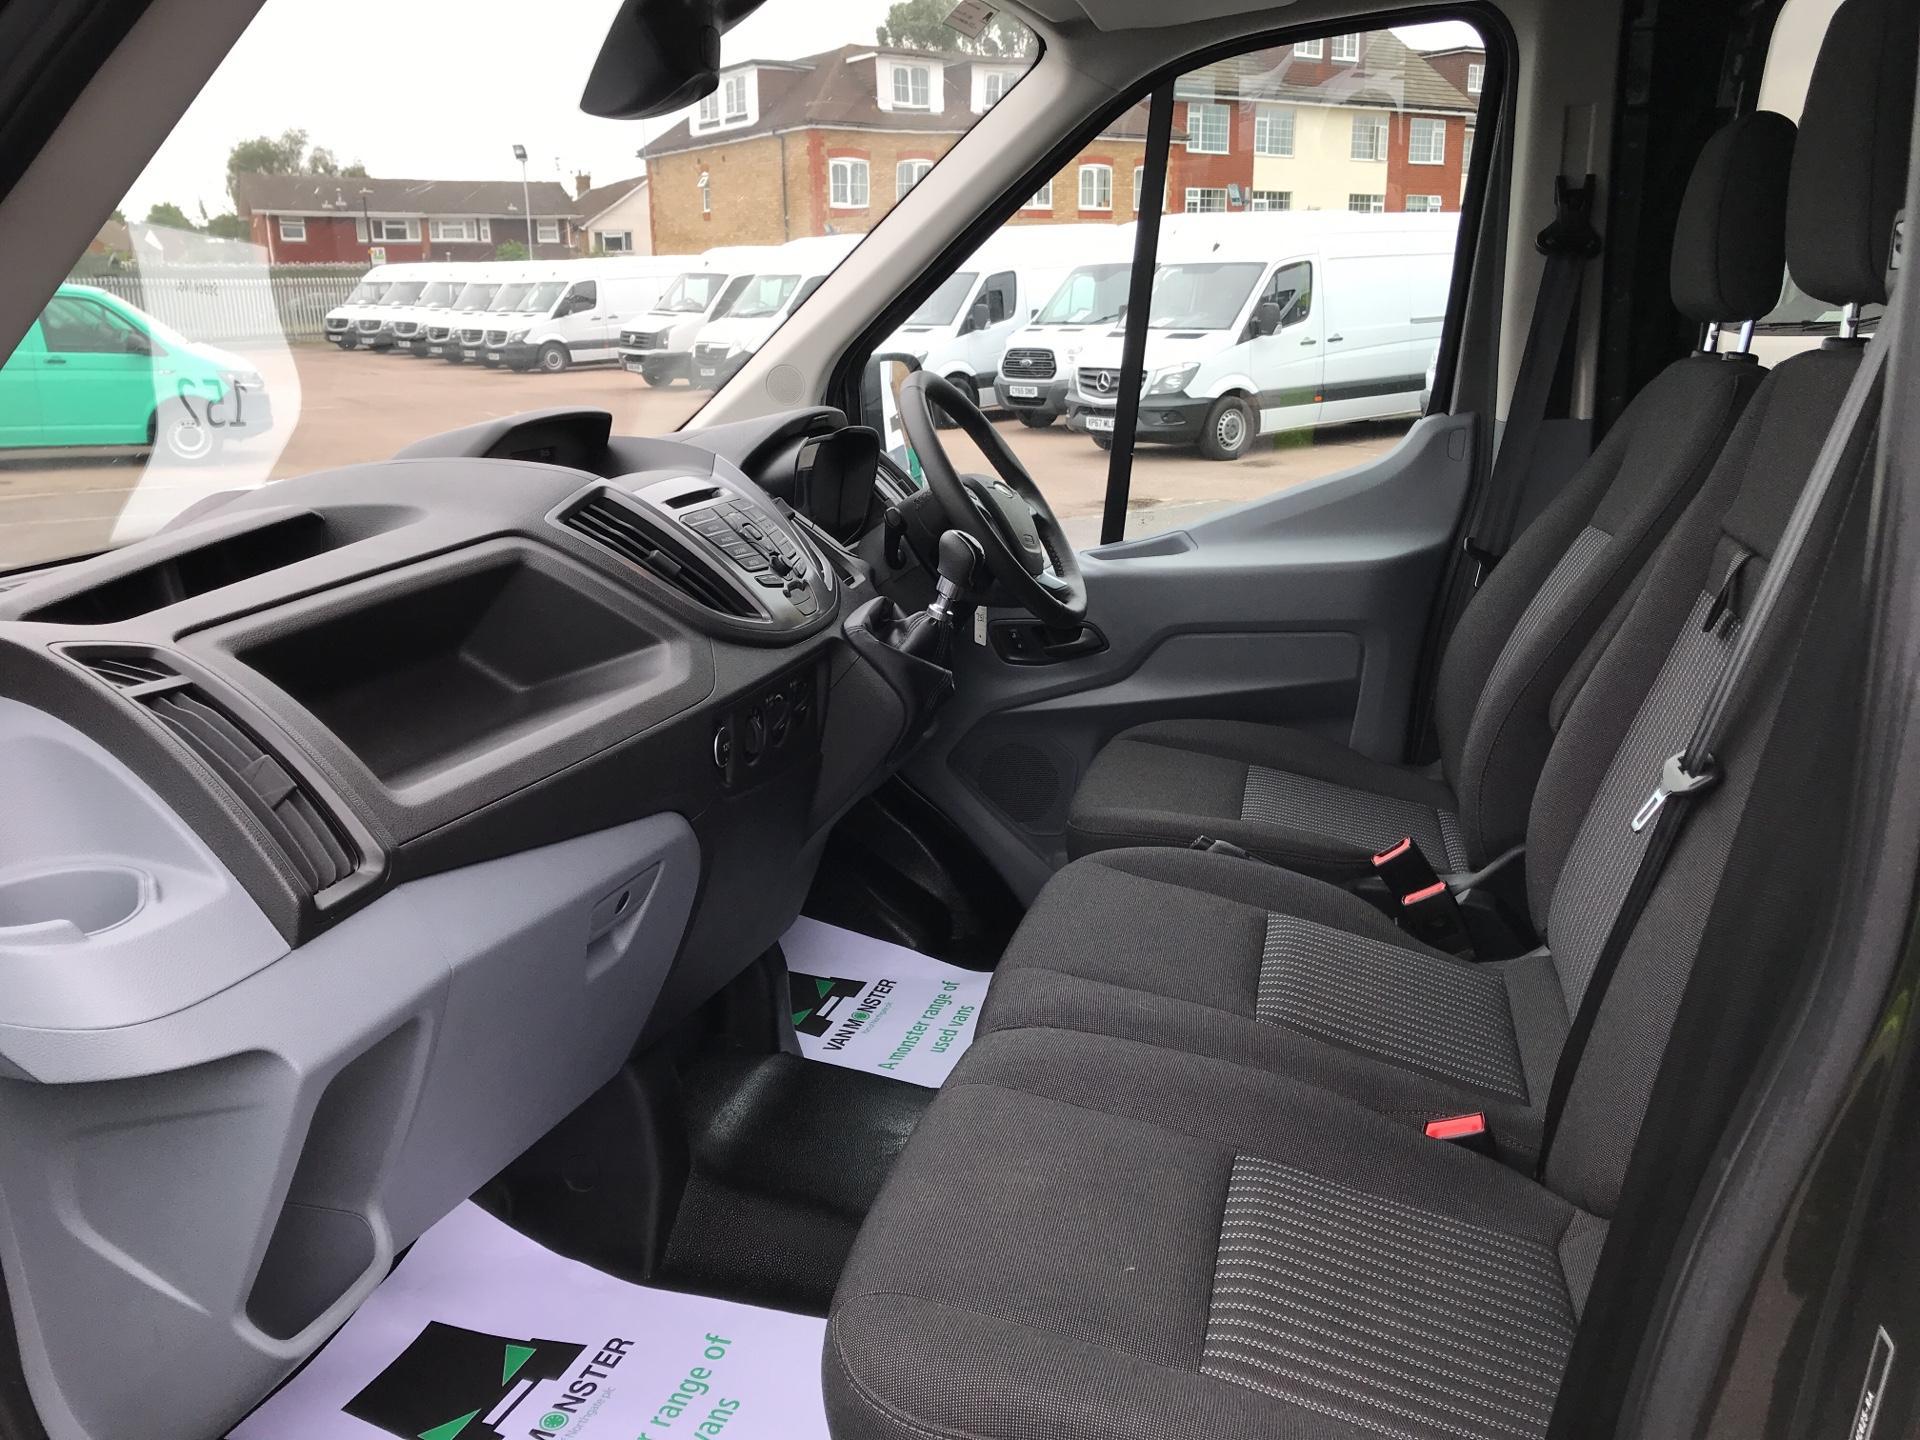 2018 Ford Transit 2.0 Tdci 130Ps H2 D/Cab Van EURO 6 (AO68SXU) Image 14